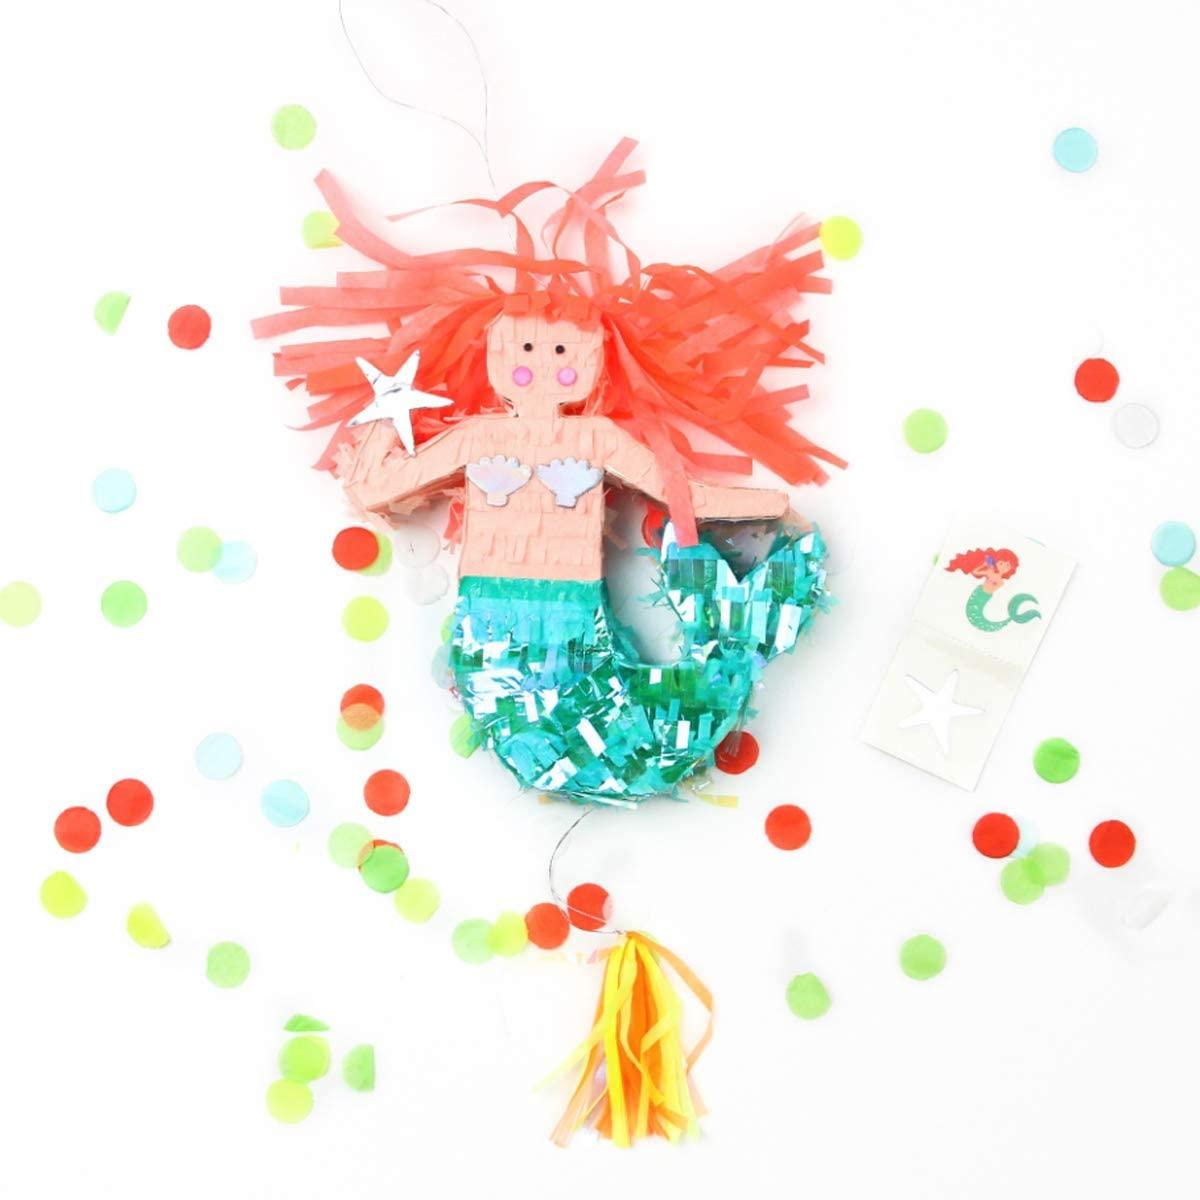 NICROLANDEE Mermaid Pinata - Under The Sea Theme Mermaid String Pinata with Tassel Confetti Tattoo Stickers for Girls First Birthday Party Decor